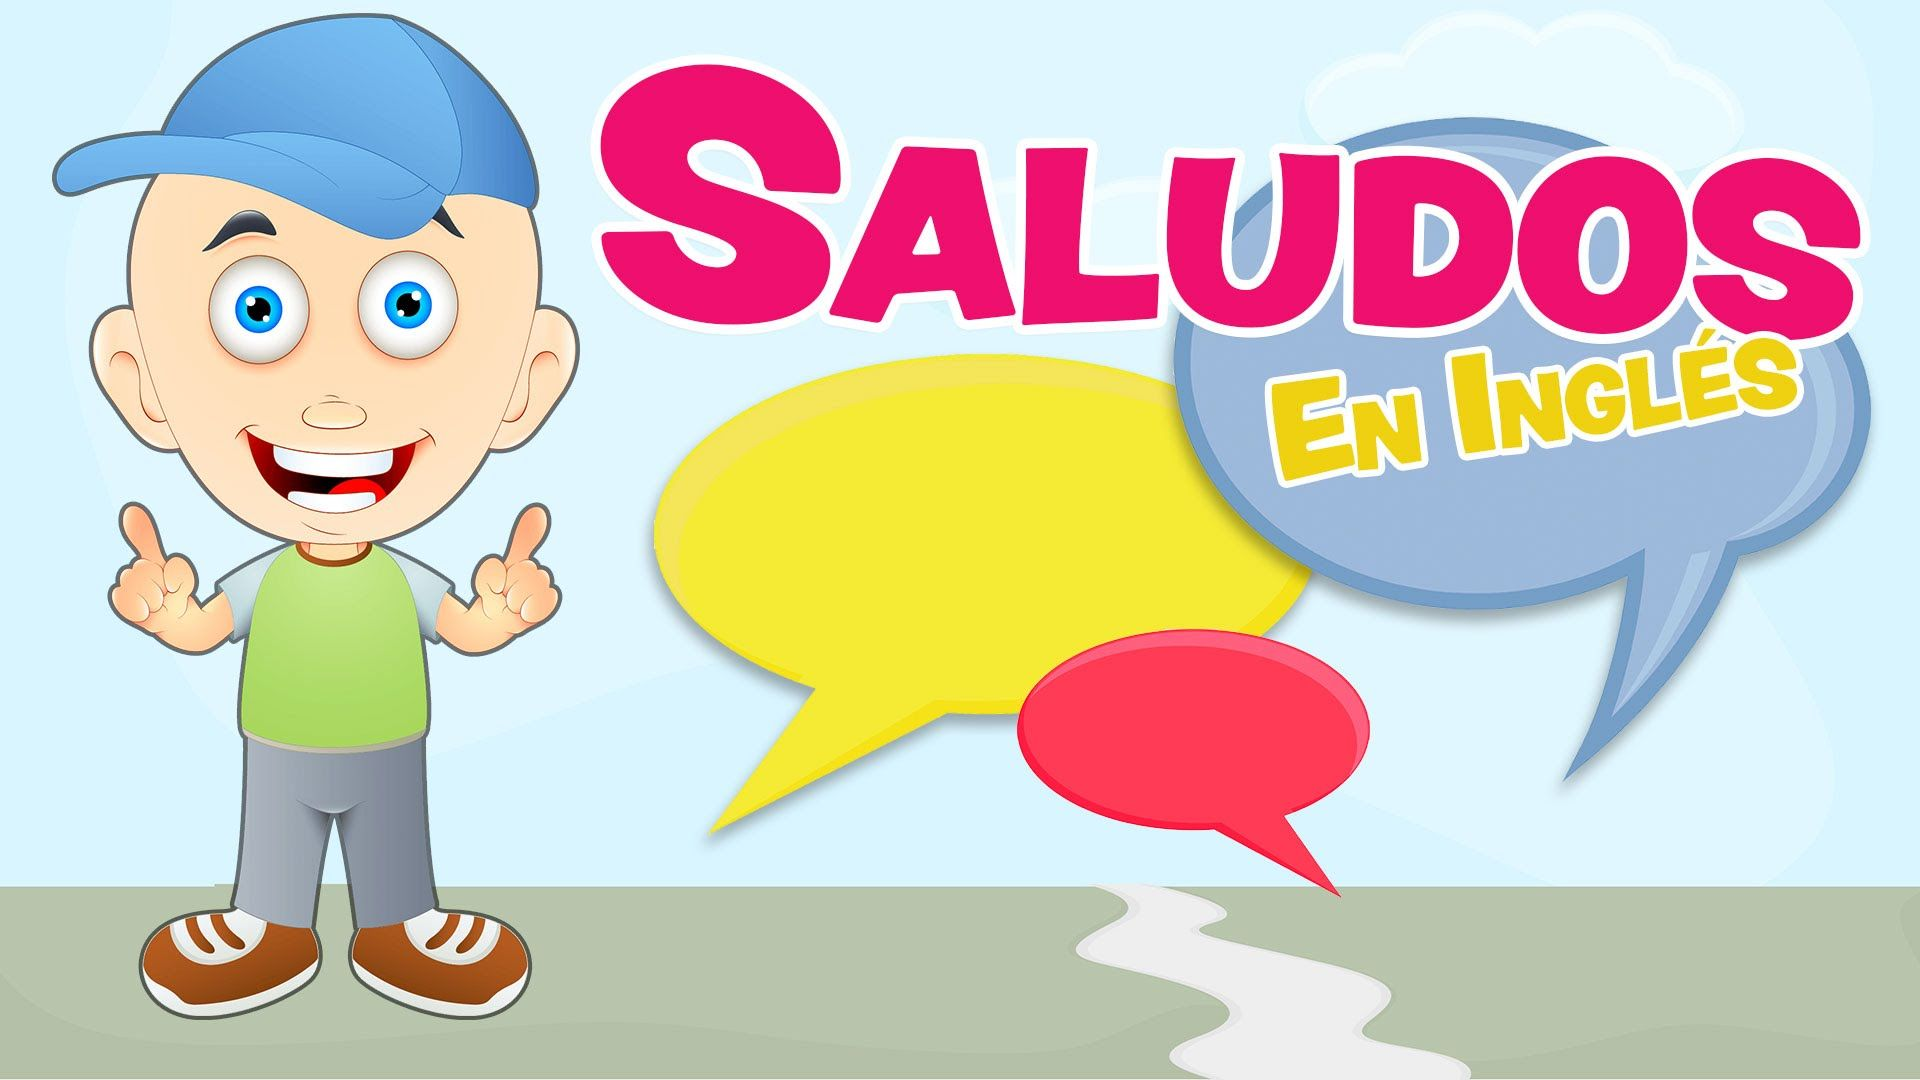 Saludos En Ingles Para Ninos Ingles Para Ninos Aprender Ingles Para Ninos Ingles Basico Para Ninos